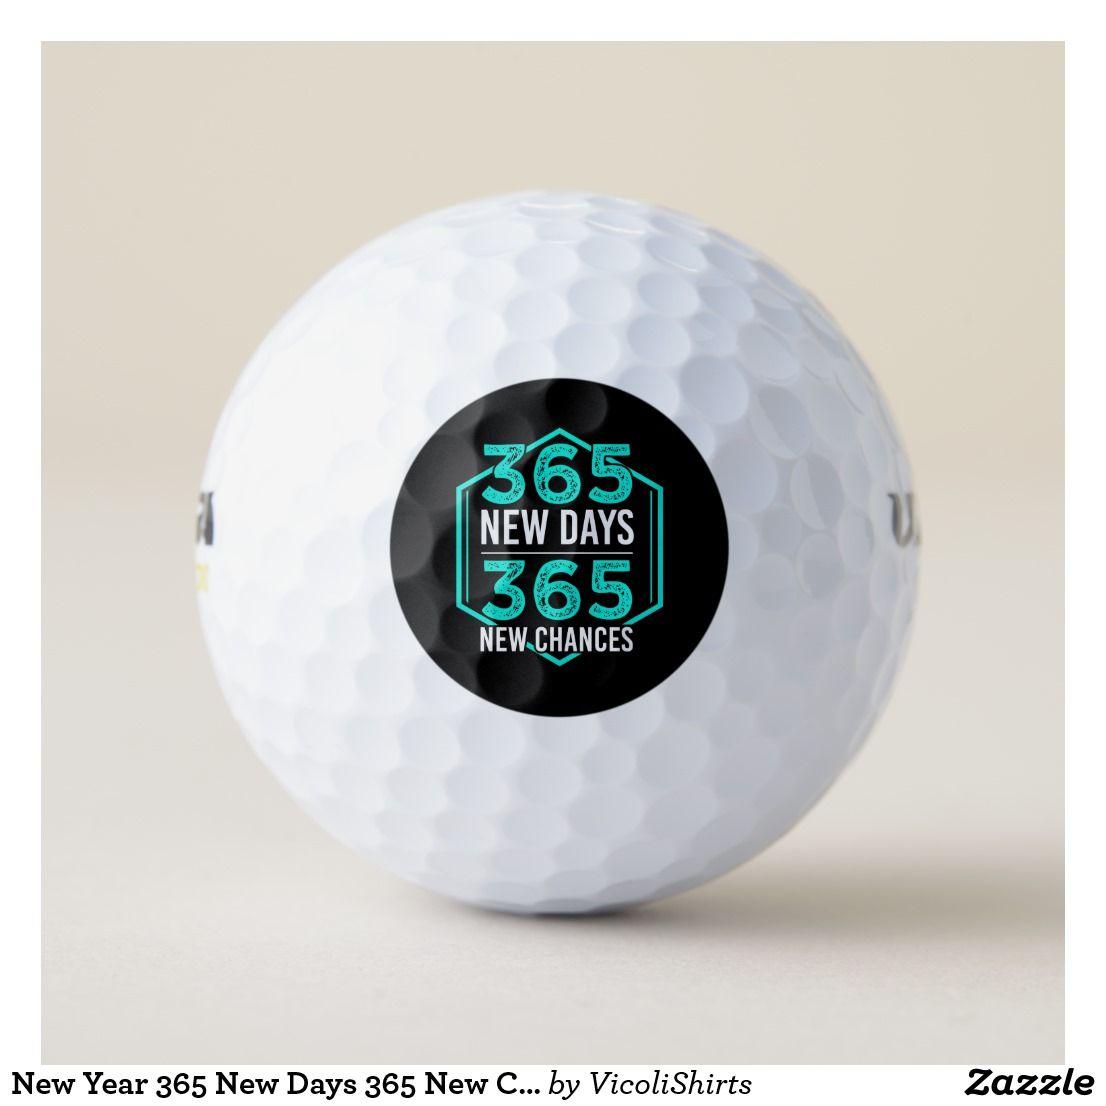 New Year 365 New Days 365 New Chances Gift Idea Golf Balls Zazzle Com Golf Ball Golf Golf Tips For Beginners